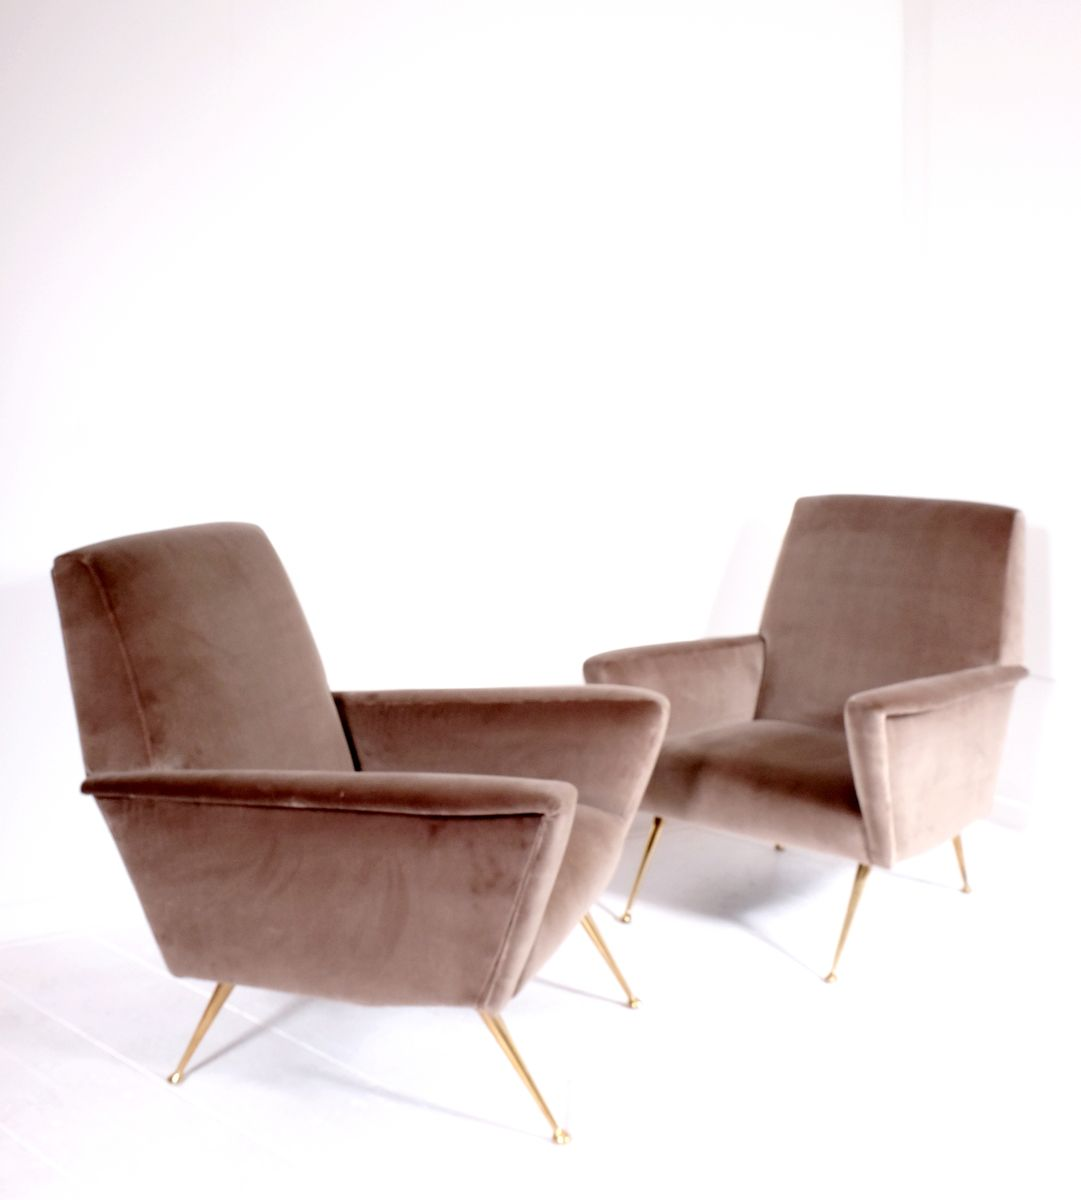 italienische armlehnst hle 1960er 2er set bei pamono kaufen. Black Bedroom Furniture Sets. Home Design Ideas